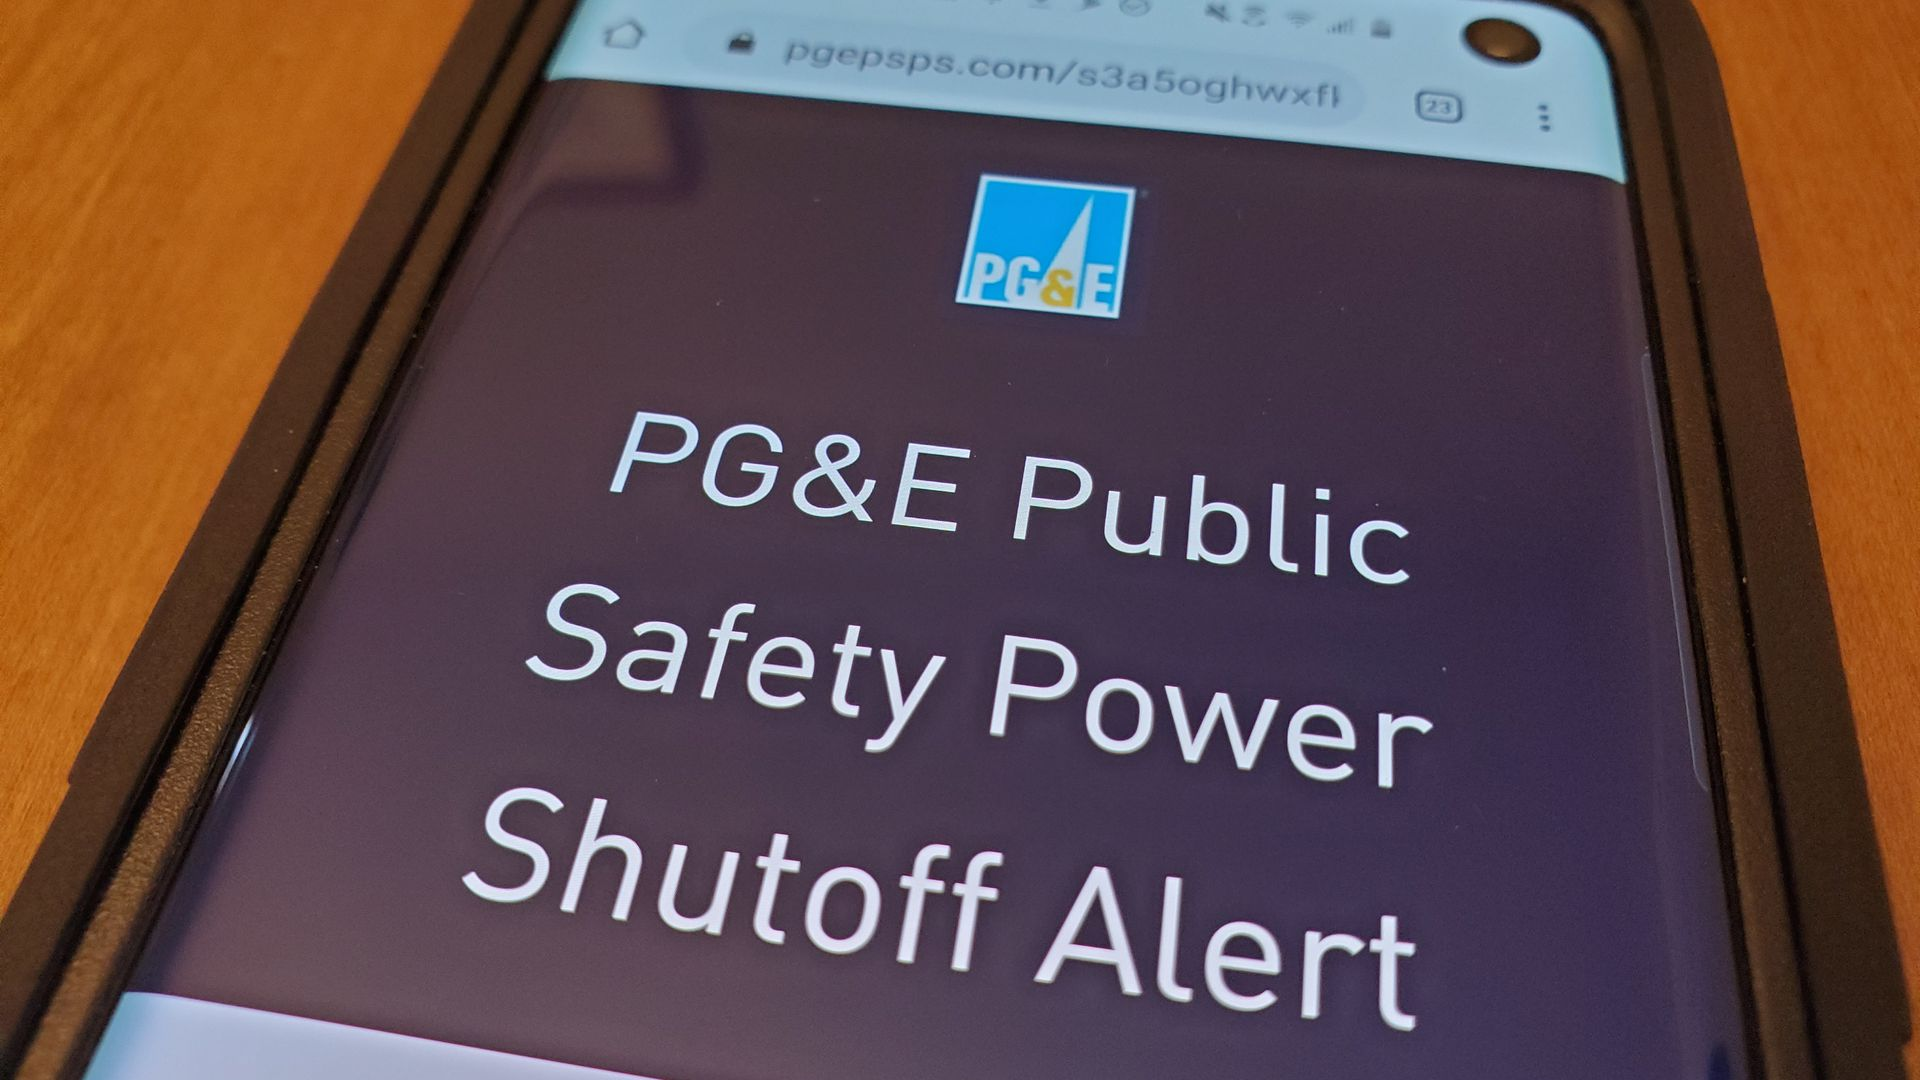 A cellphone displaying a PG&E power alert.